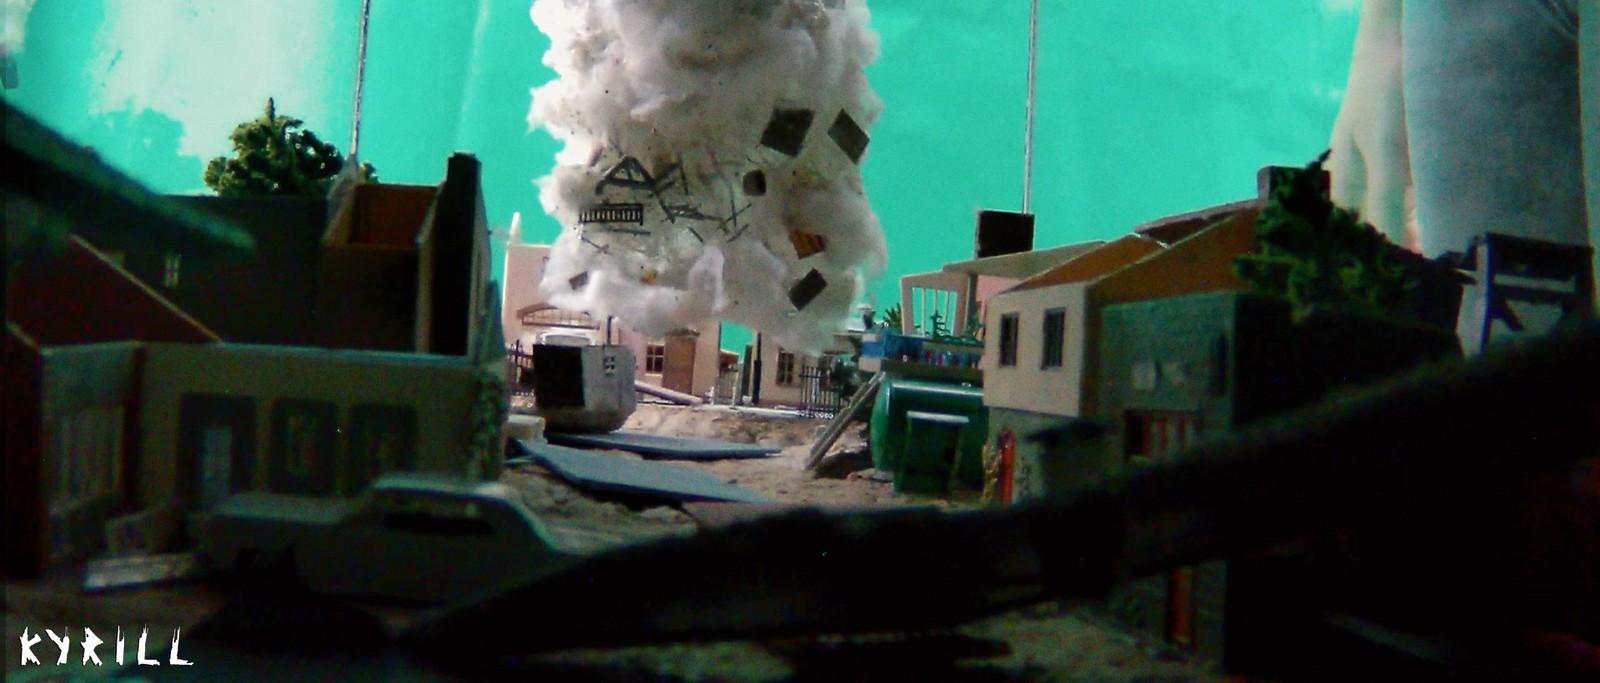 Tornado test while destructing